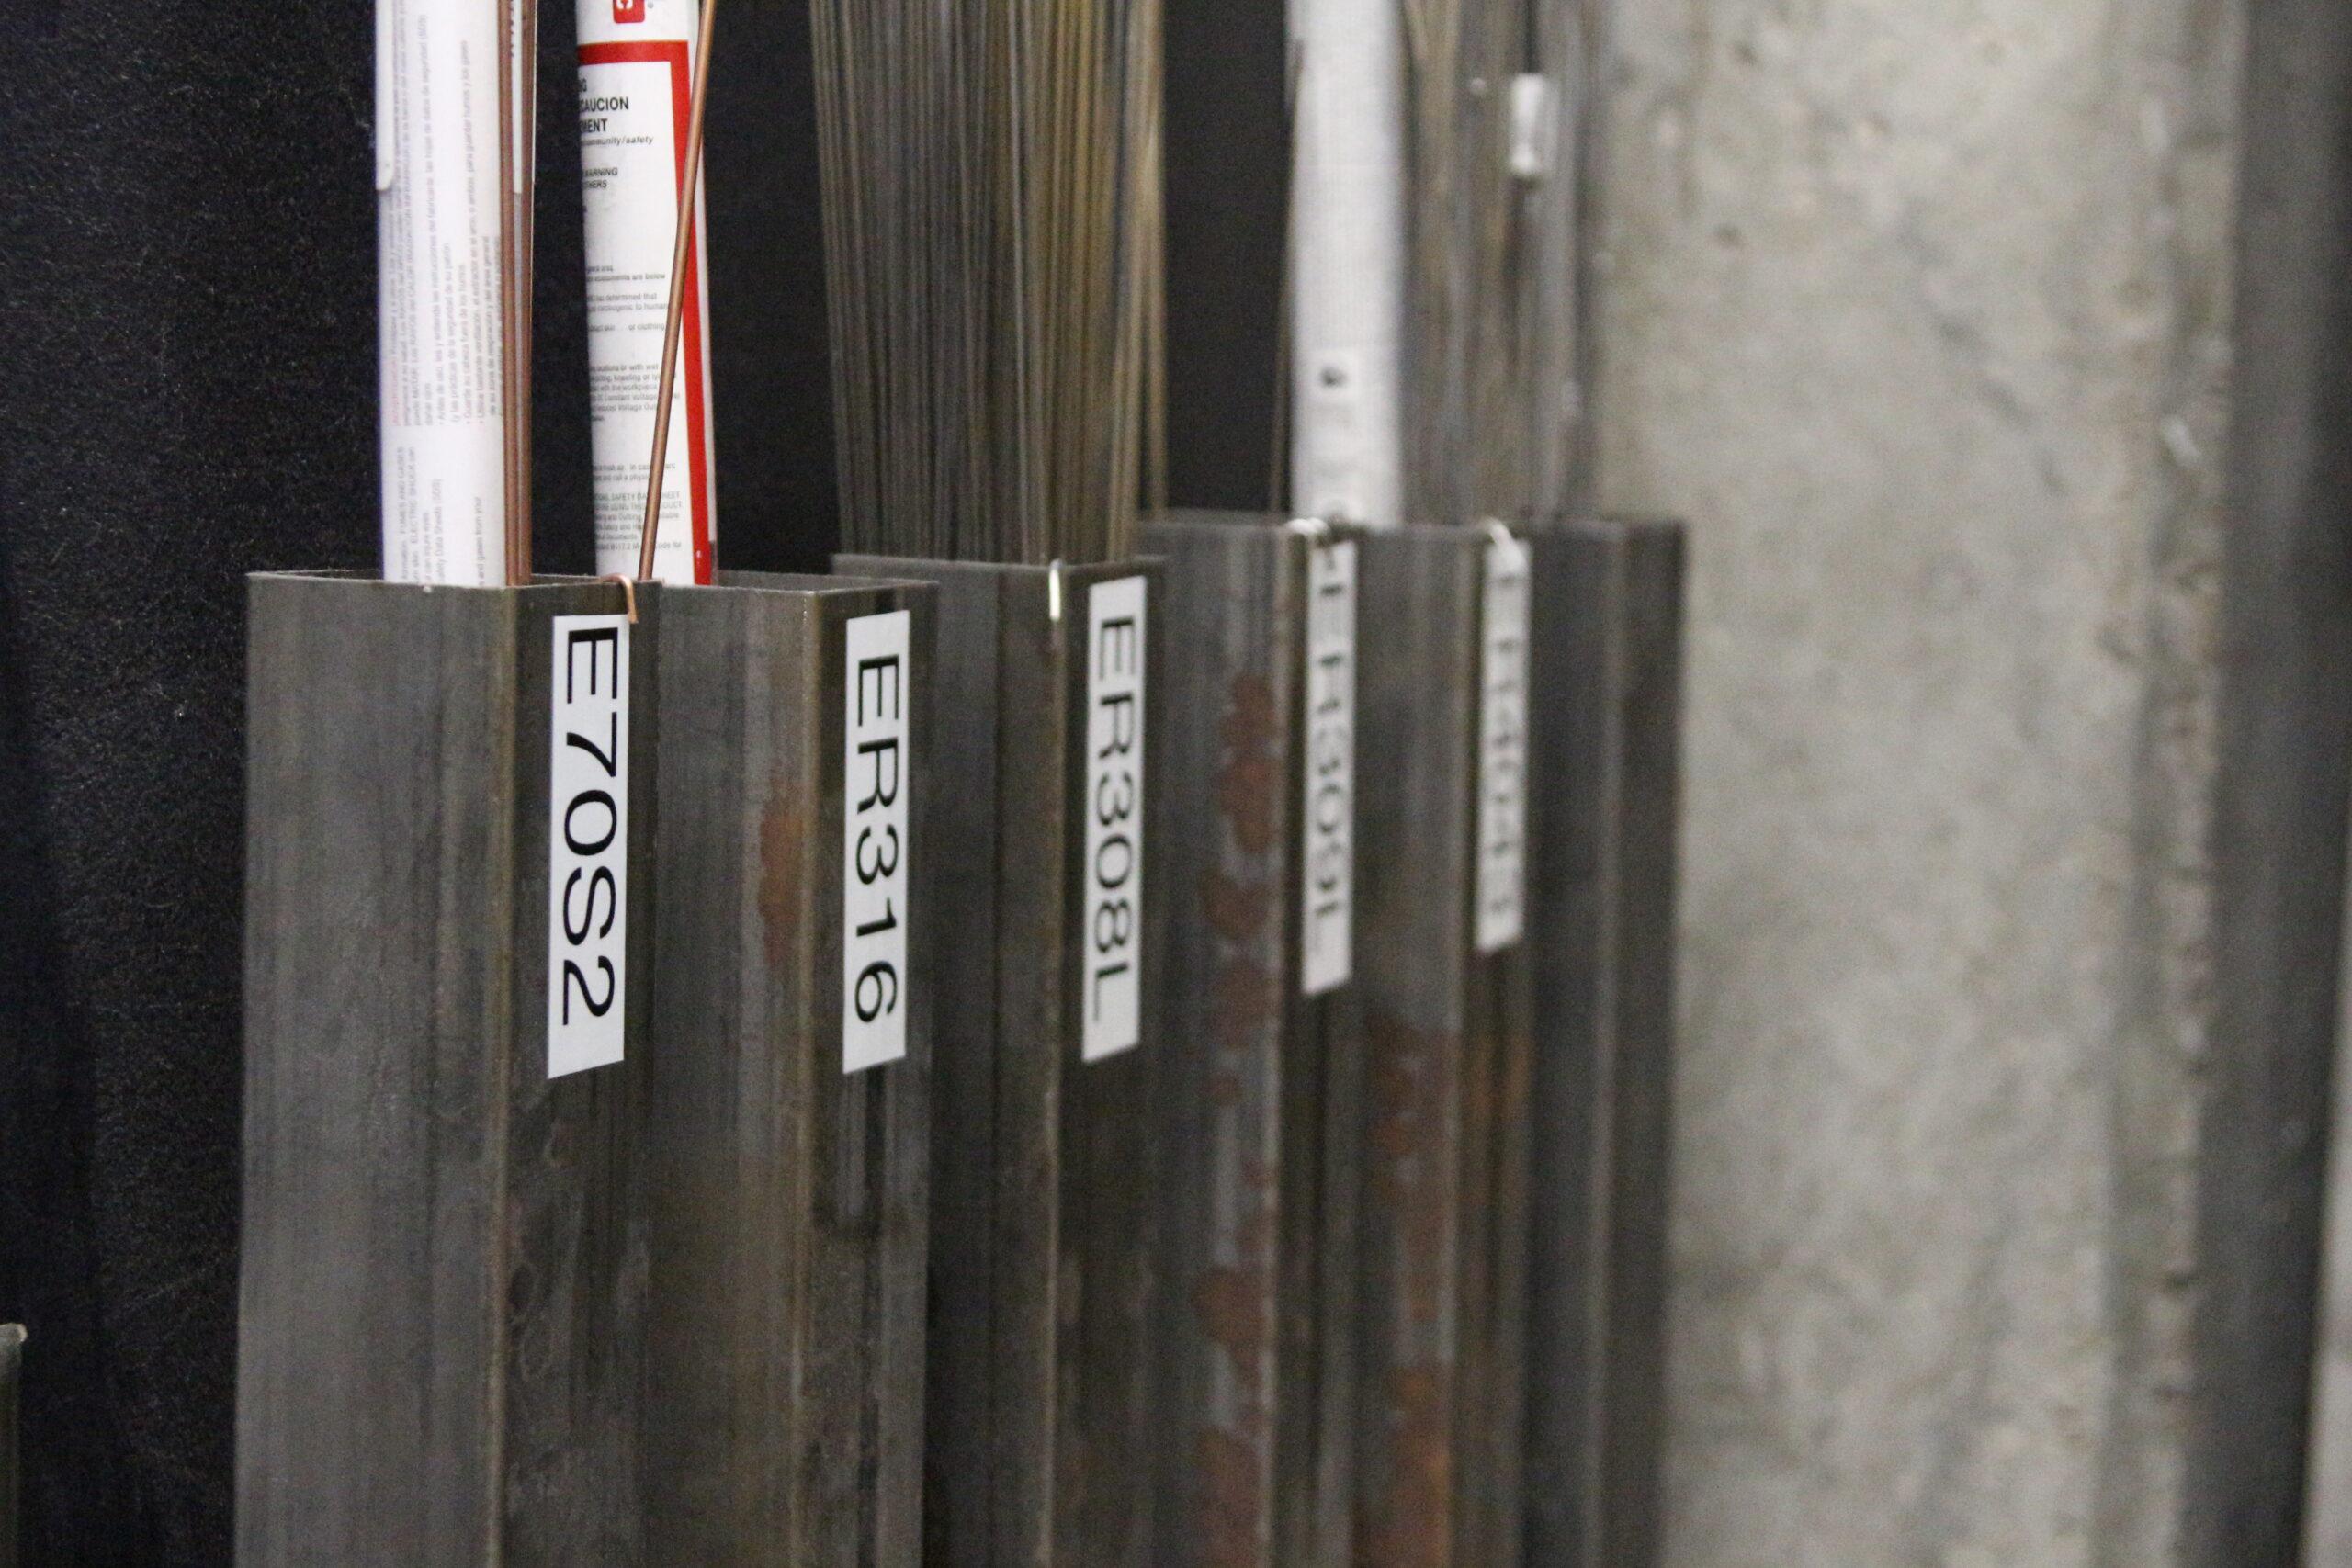 Filler material for TIG welder. E7092 visible.